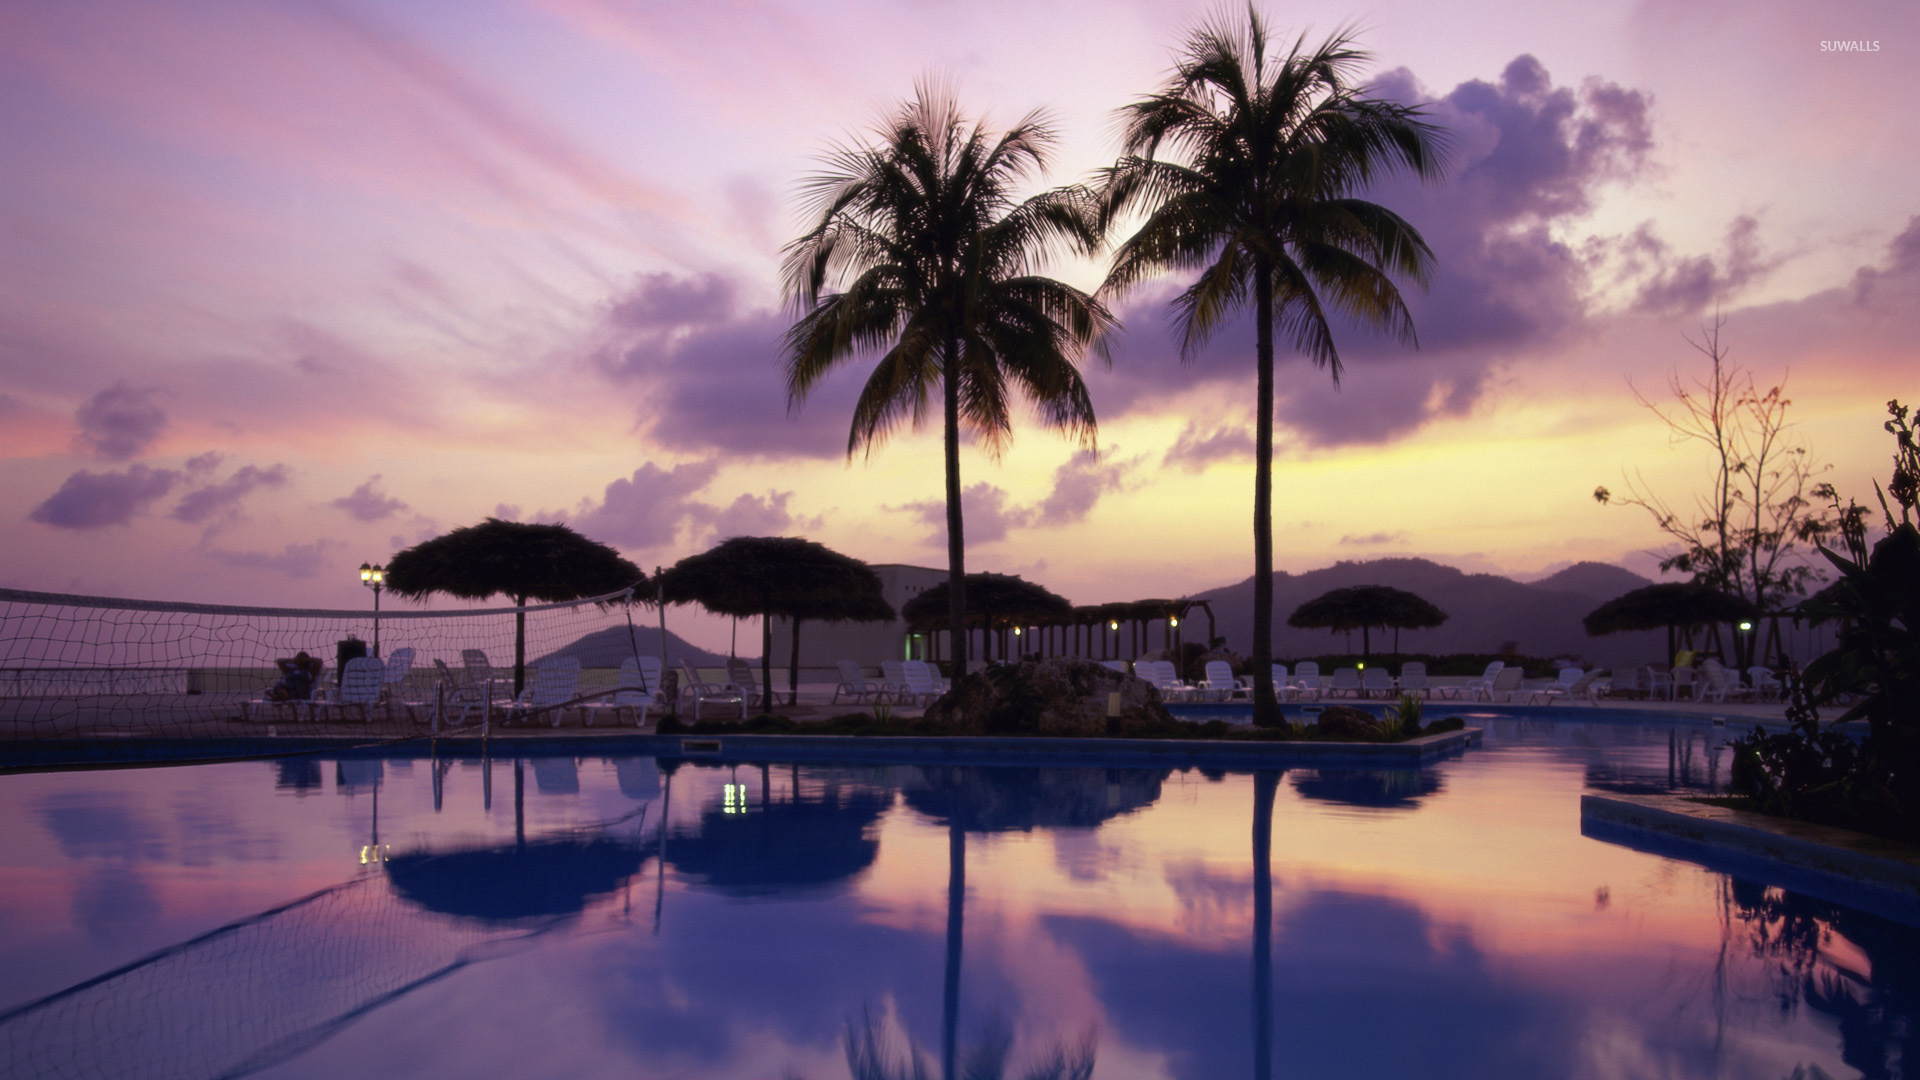 Beach Resort Wallpaper 21: Purple Sunset Over The Resort Wallpaper